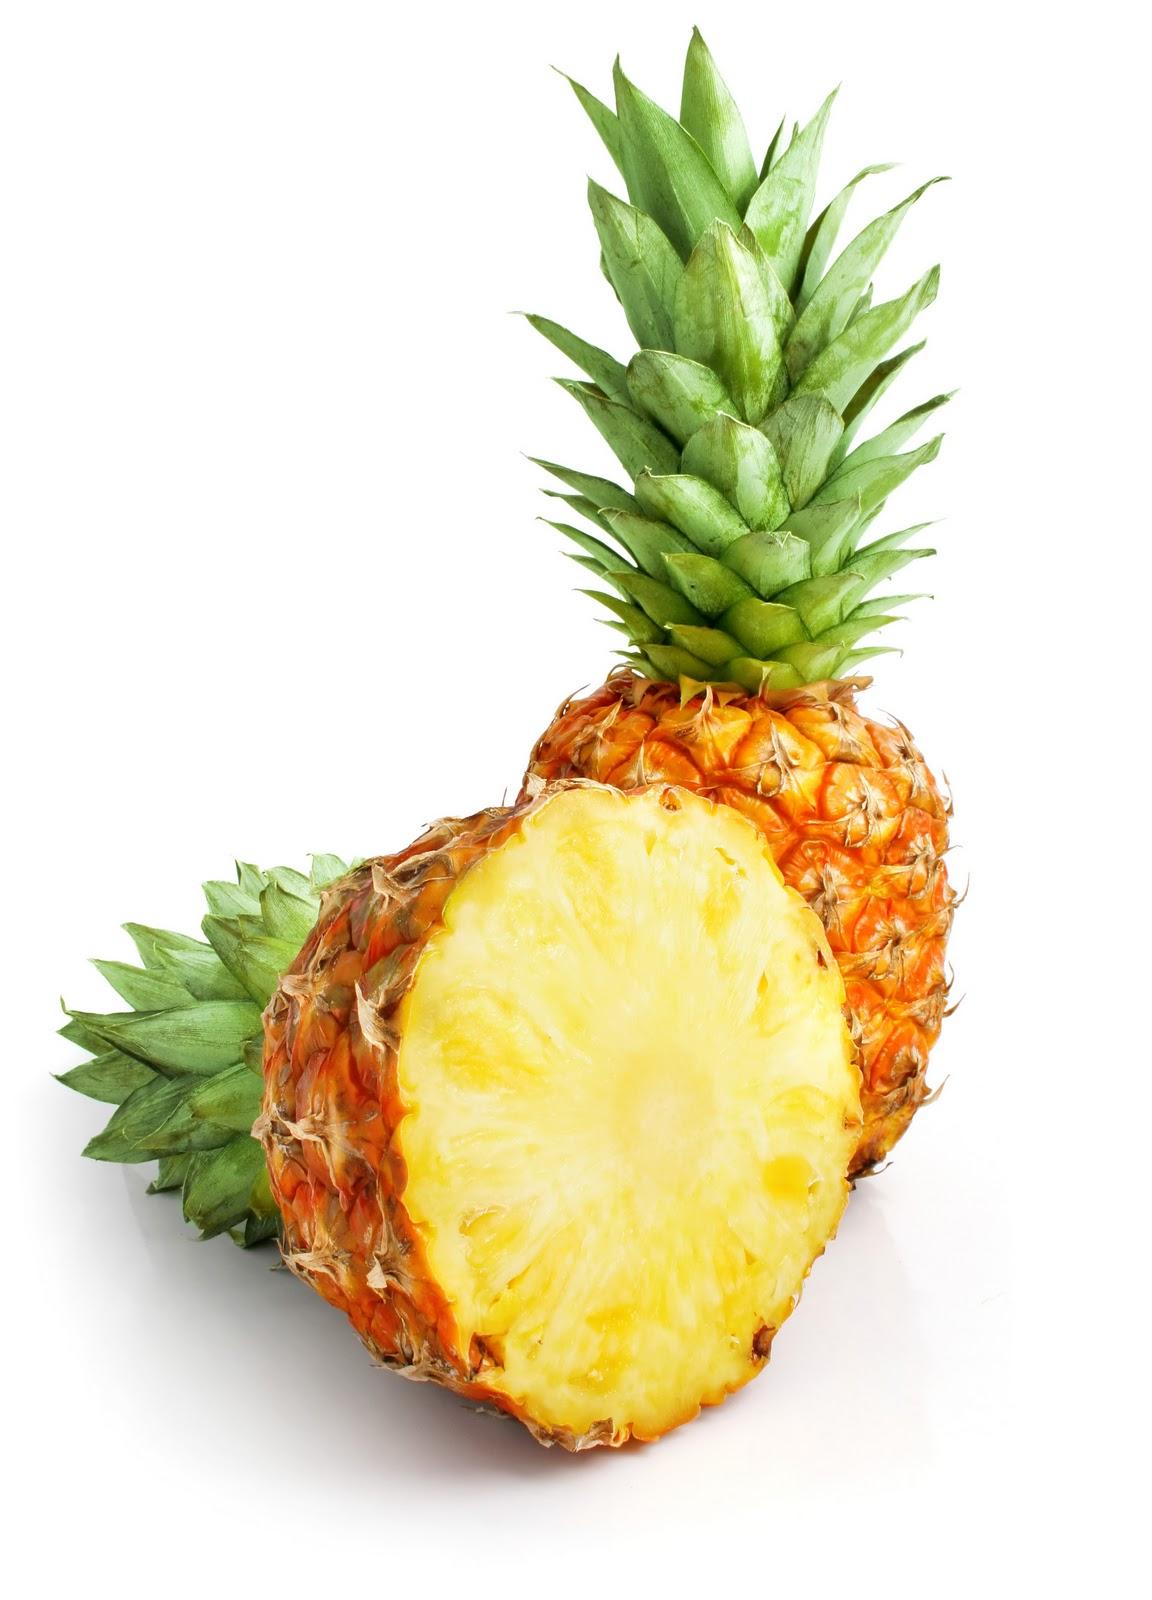 http://4.bp.blogspot.com/-CVFCRapvnpg/Tw9XKoaFxvI/AAAAAAAABpY/OB2R4MBXeHA/s1600/ananas.jpg